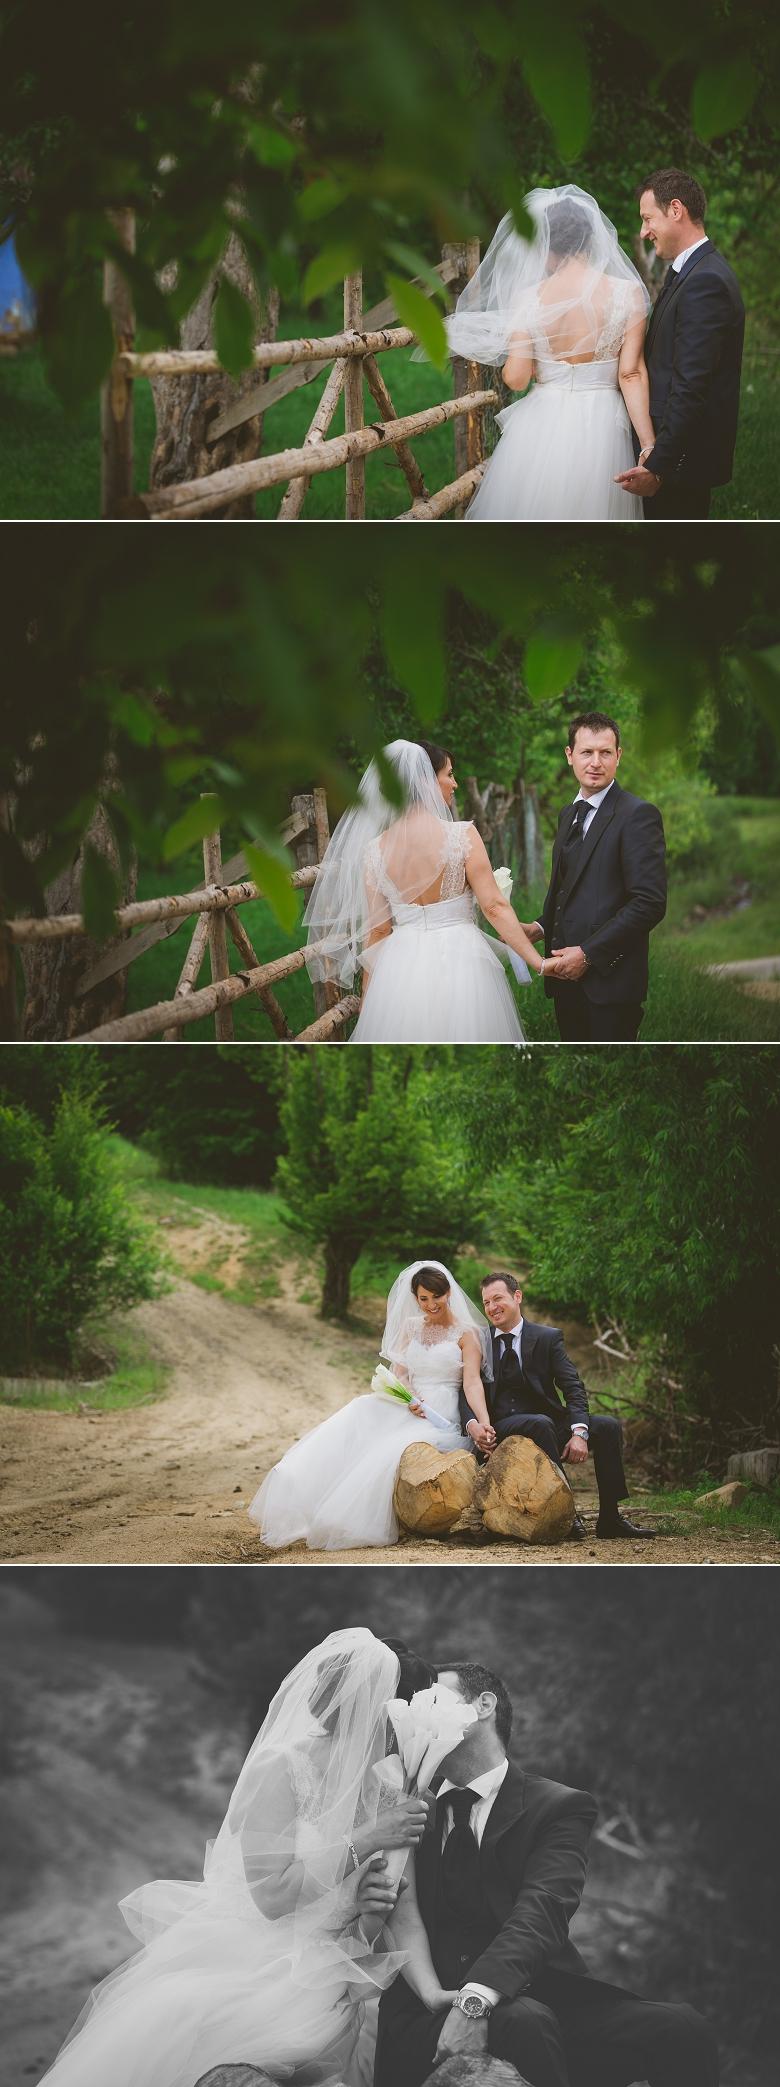 sedinta_foto_dupa_nunta_negresti_satu_mare_after_weeding_satu_mare_trash_the_dress_satu_mare 3